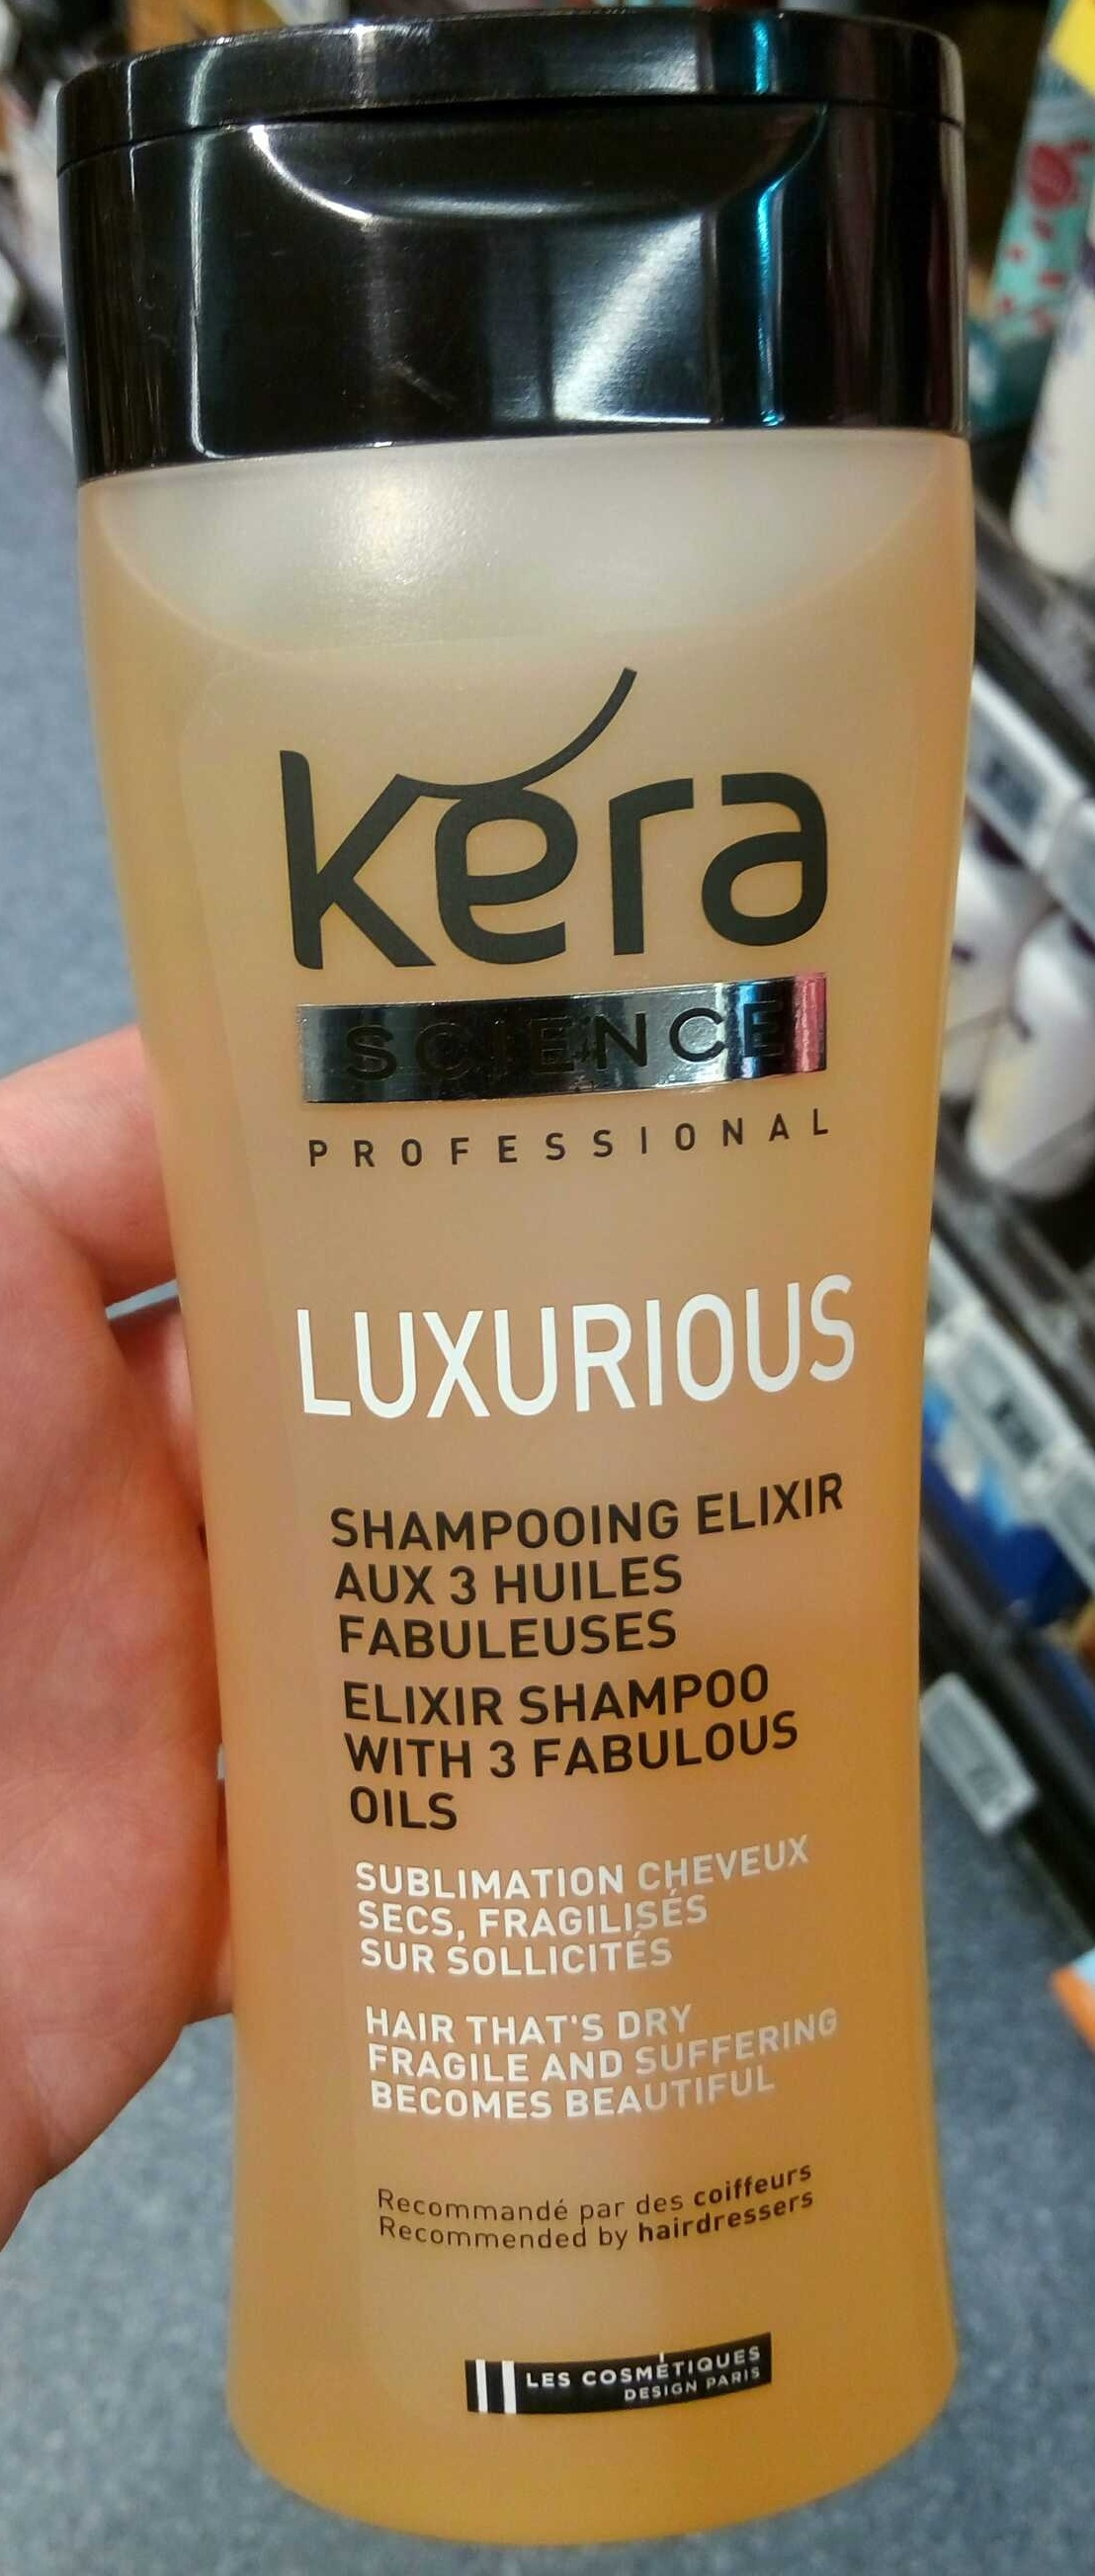 Luxurious Shampooing elixir aux 3 huiles fabuleuses - Product - fr